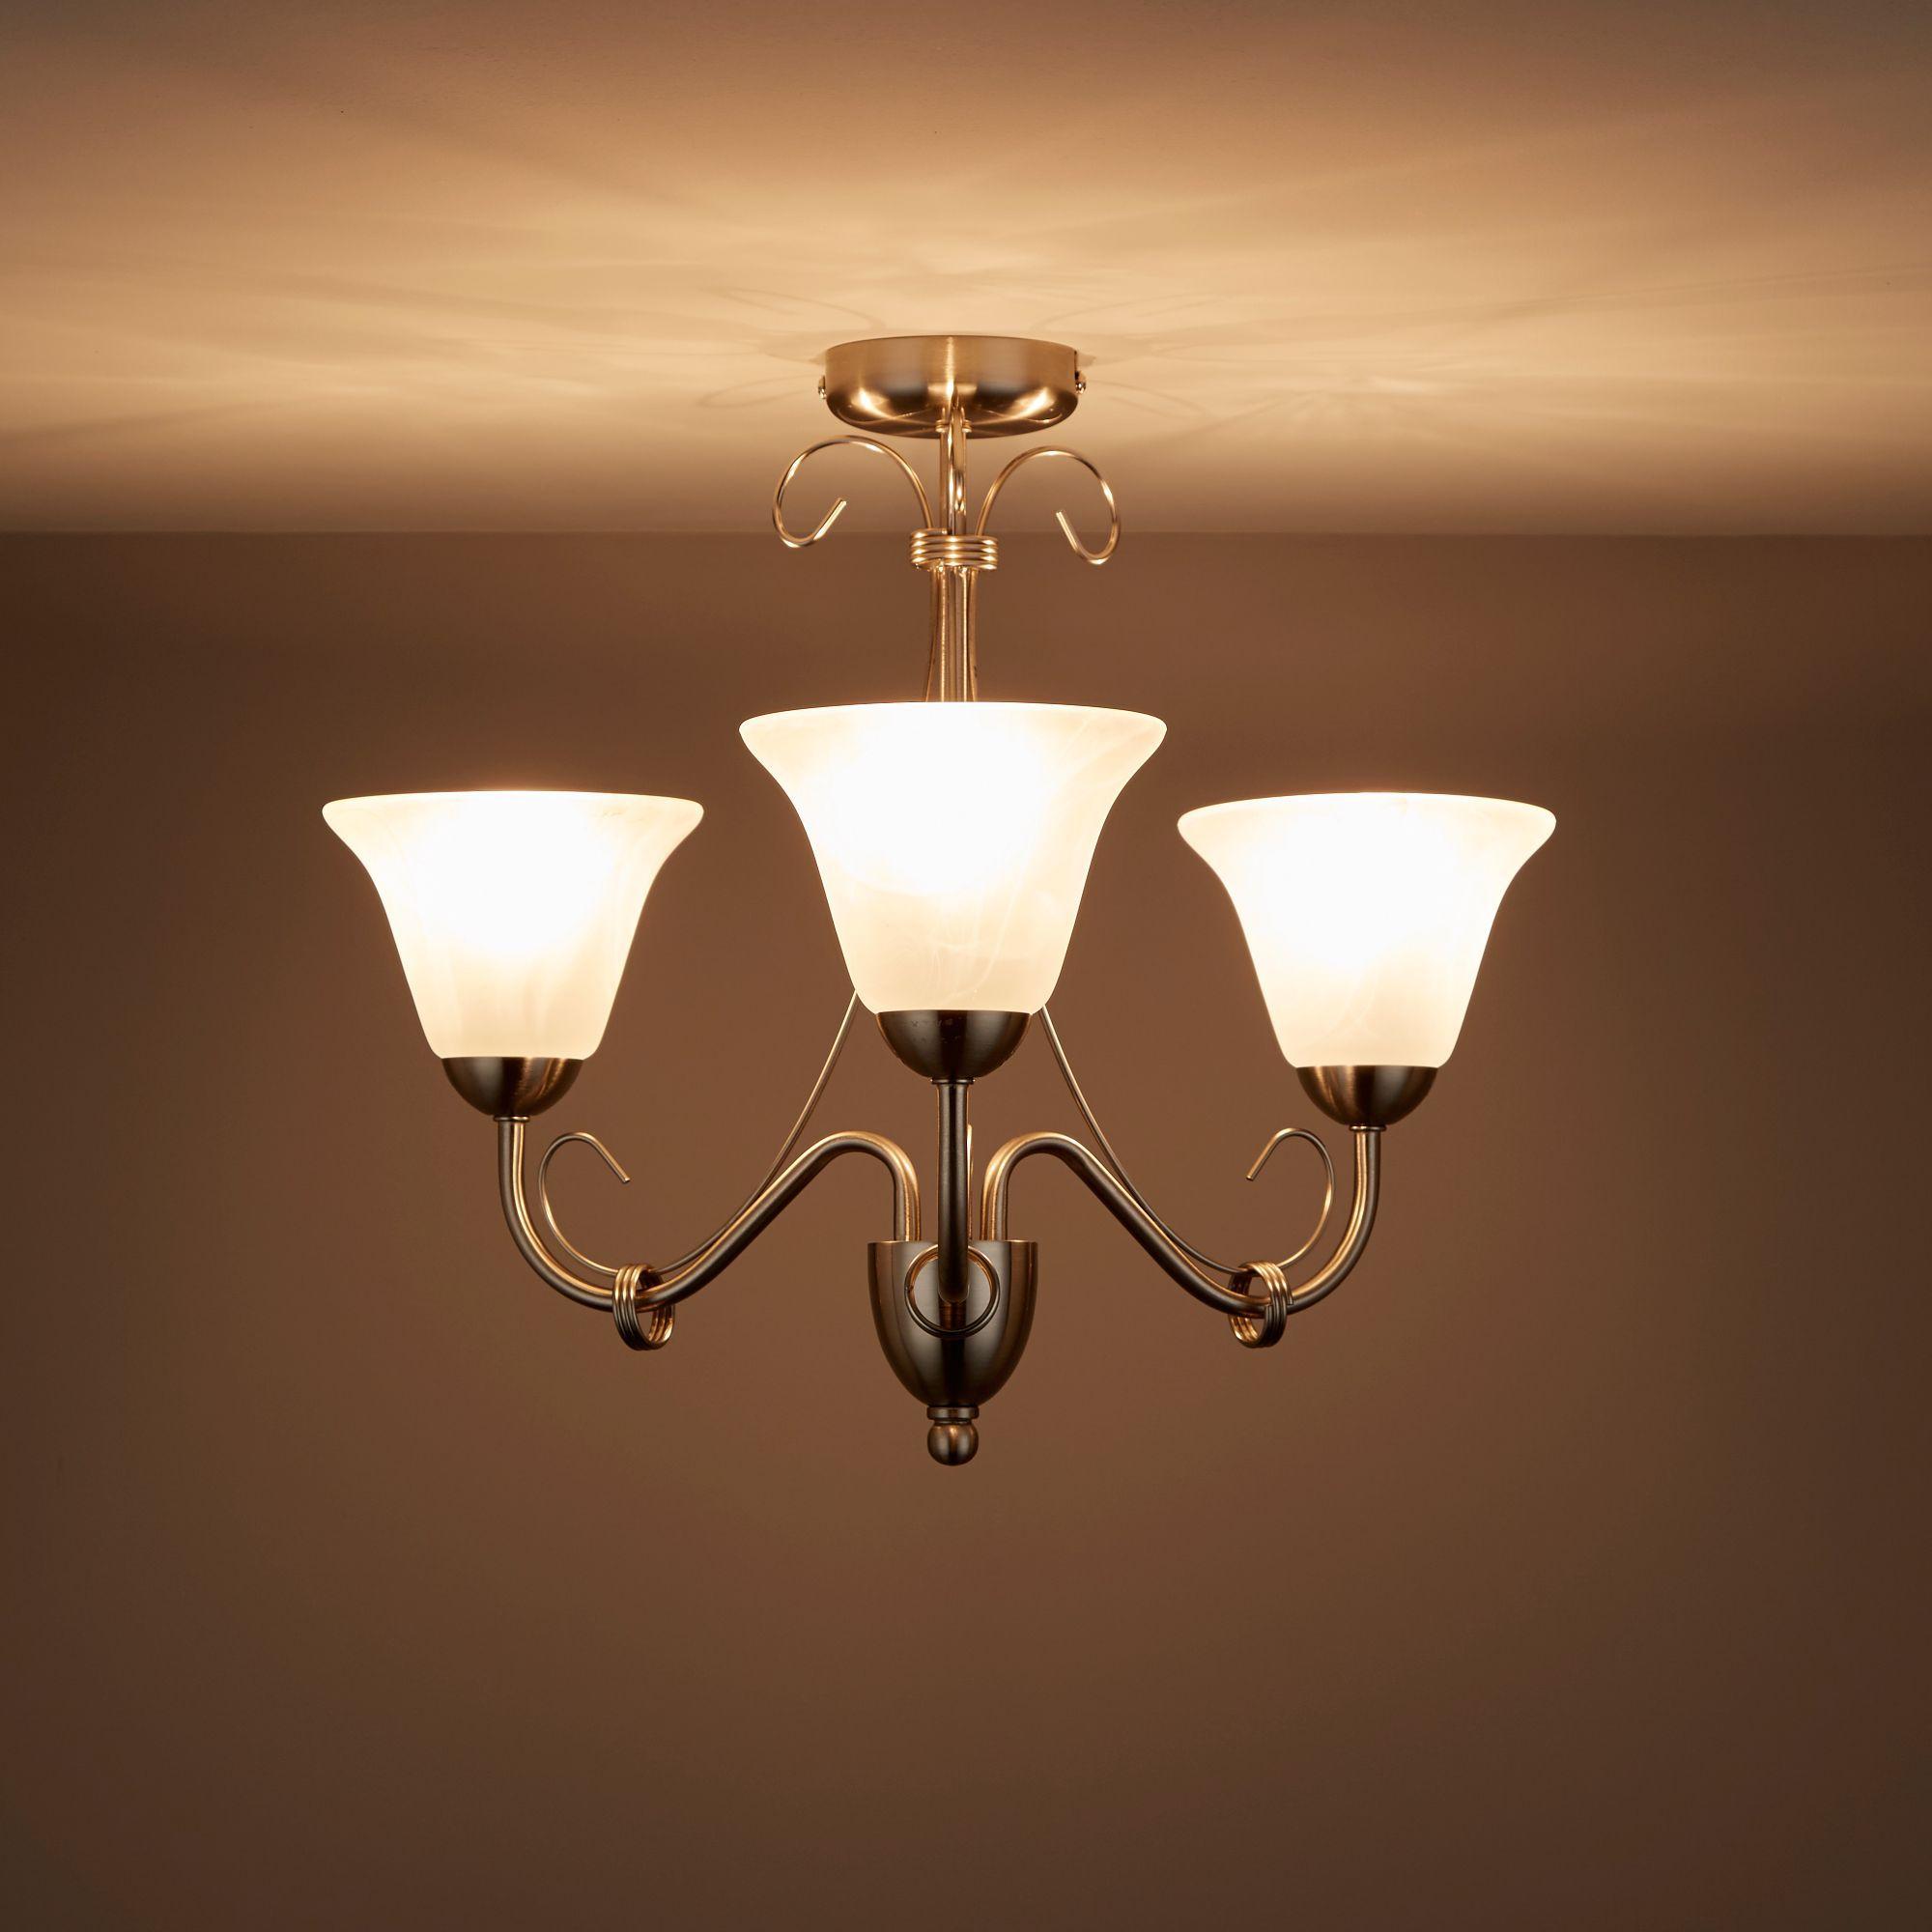 Dives Brushed chrome effect 3 Lamp Ceiling light